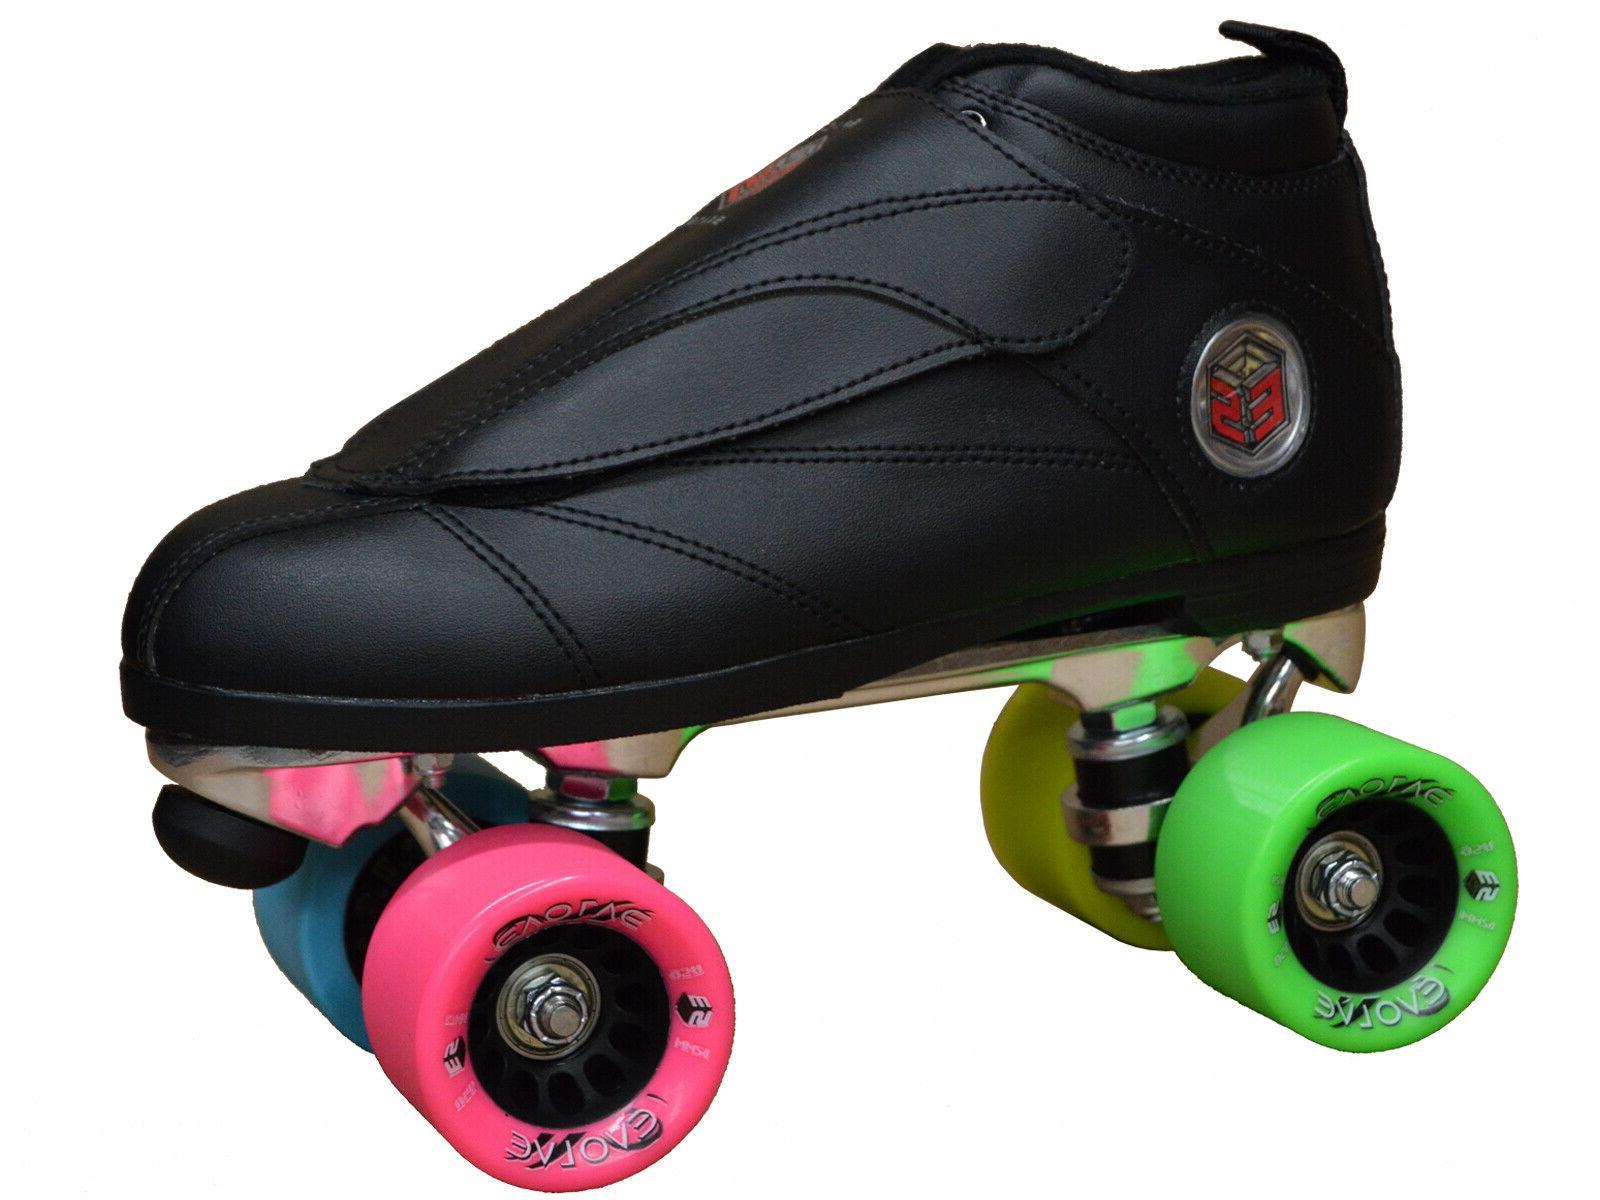 New! Black & Epic Skates Evolution Roller